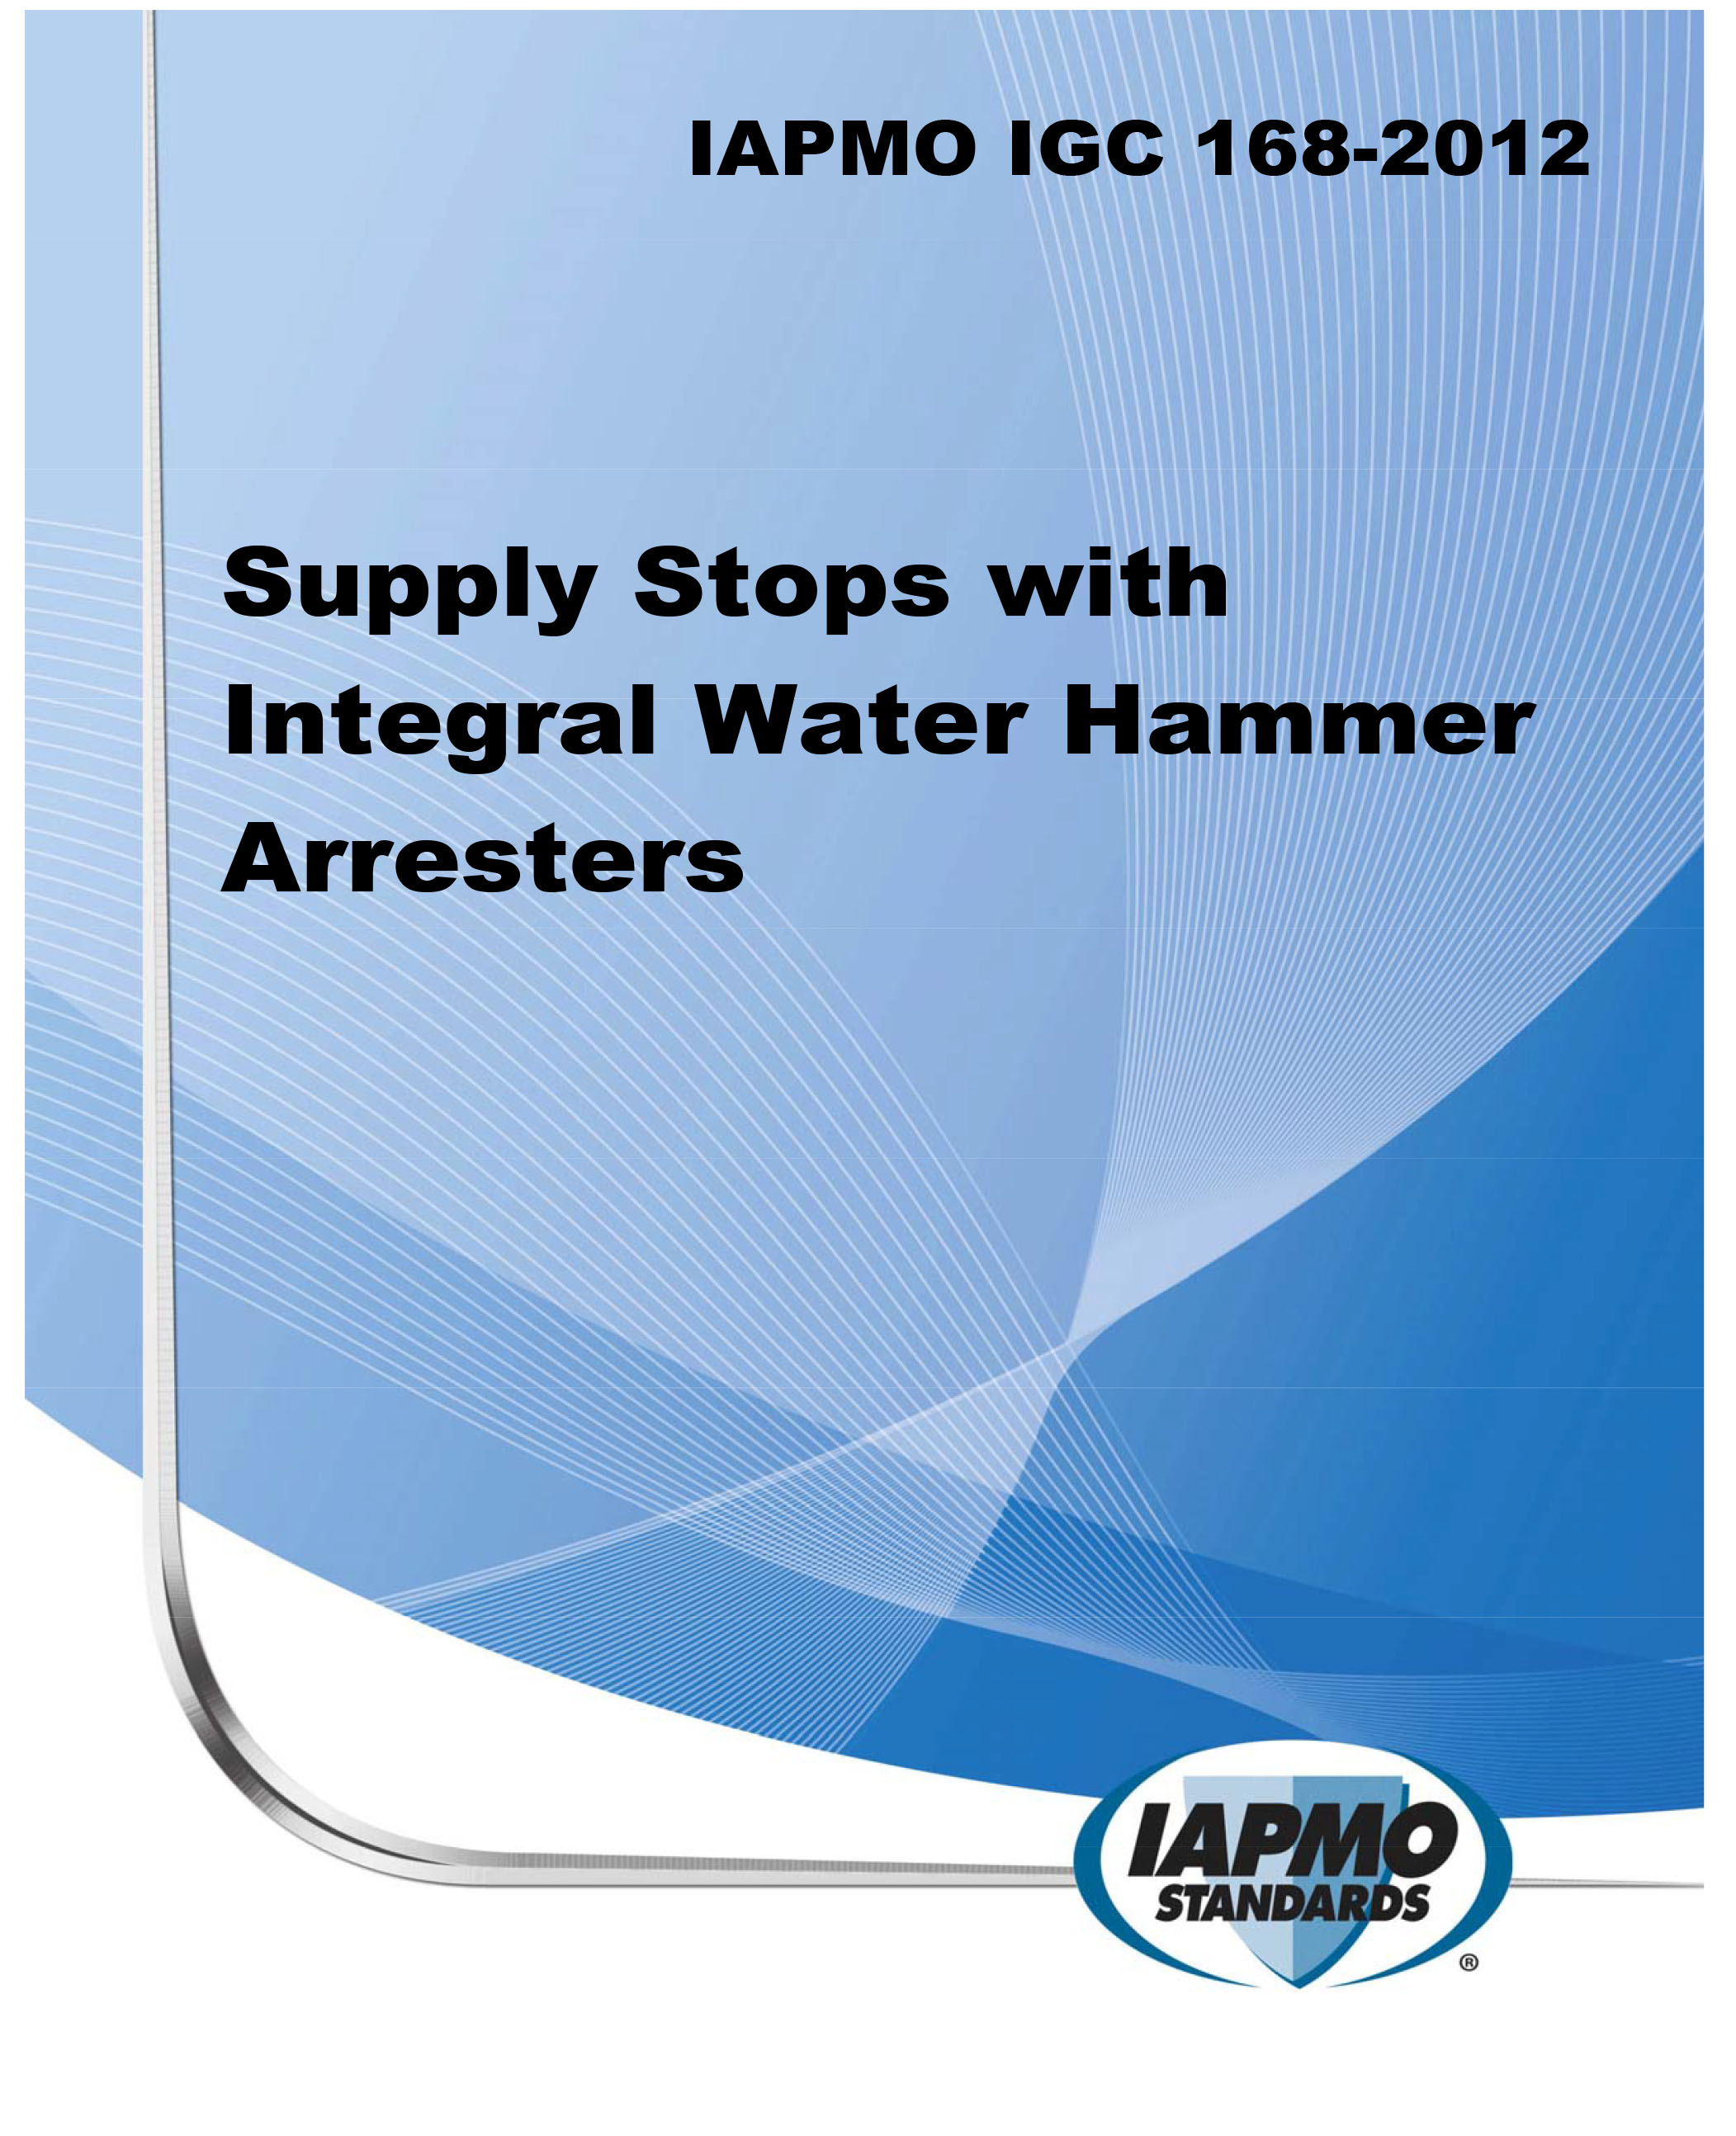 IAPMO IGC 168-2012